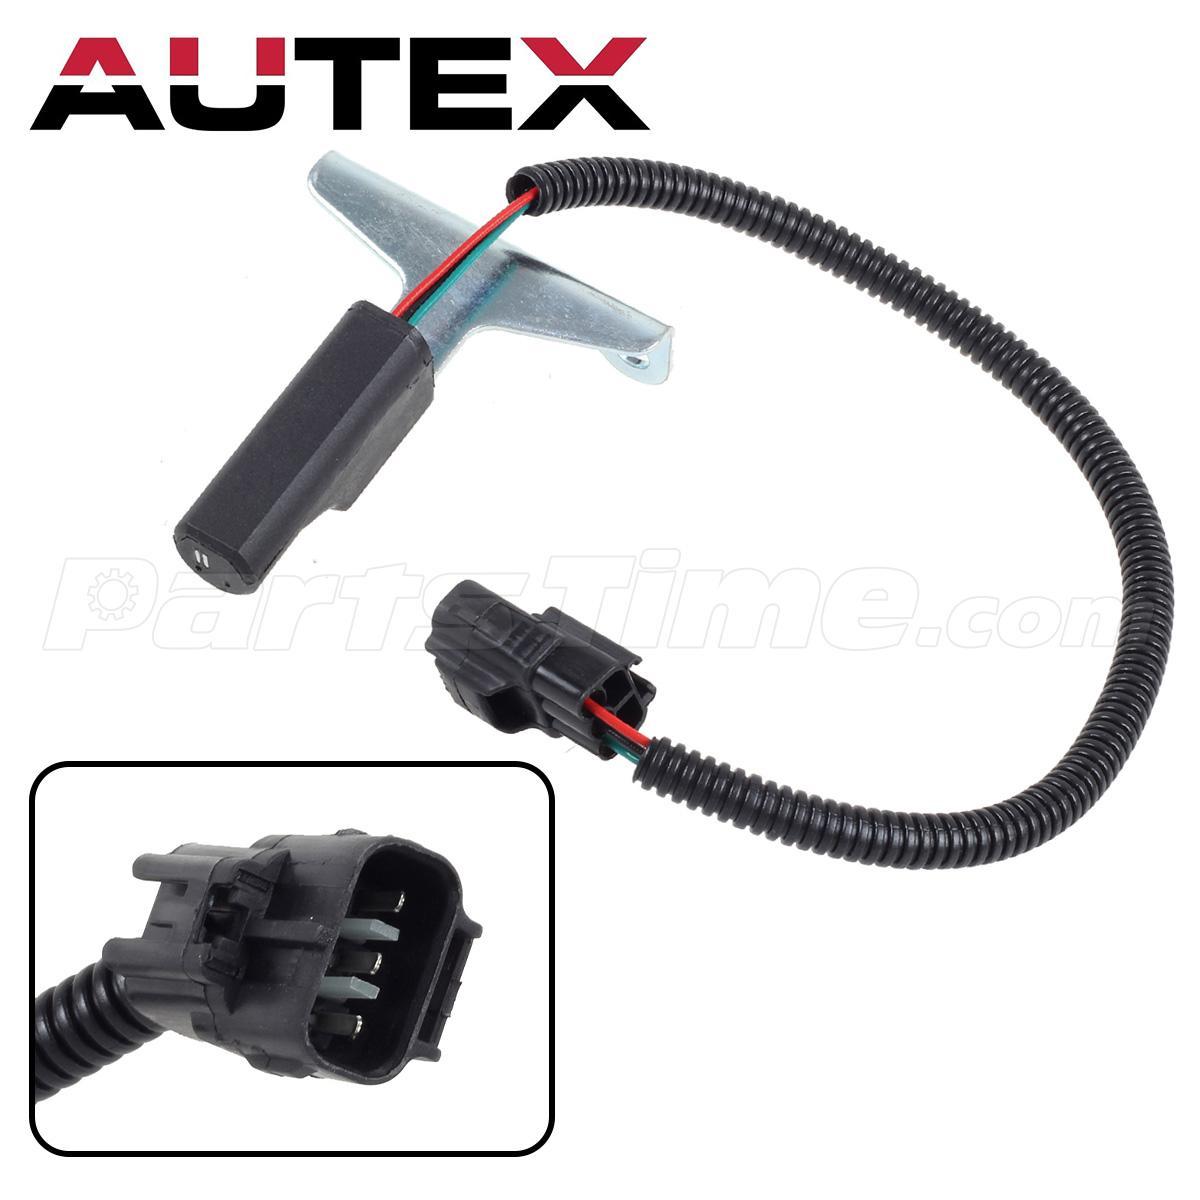 1998 jeep grand cherokee ignition wiring diagram ford 600 12 volt conversion crankshaft position sensor pc127 for 1998-2003 dodge dakota durango ram 1500 | ebay